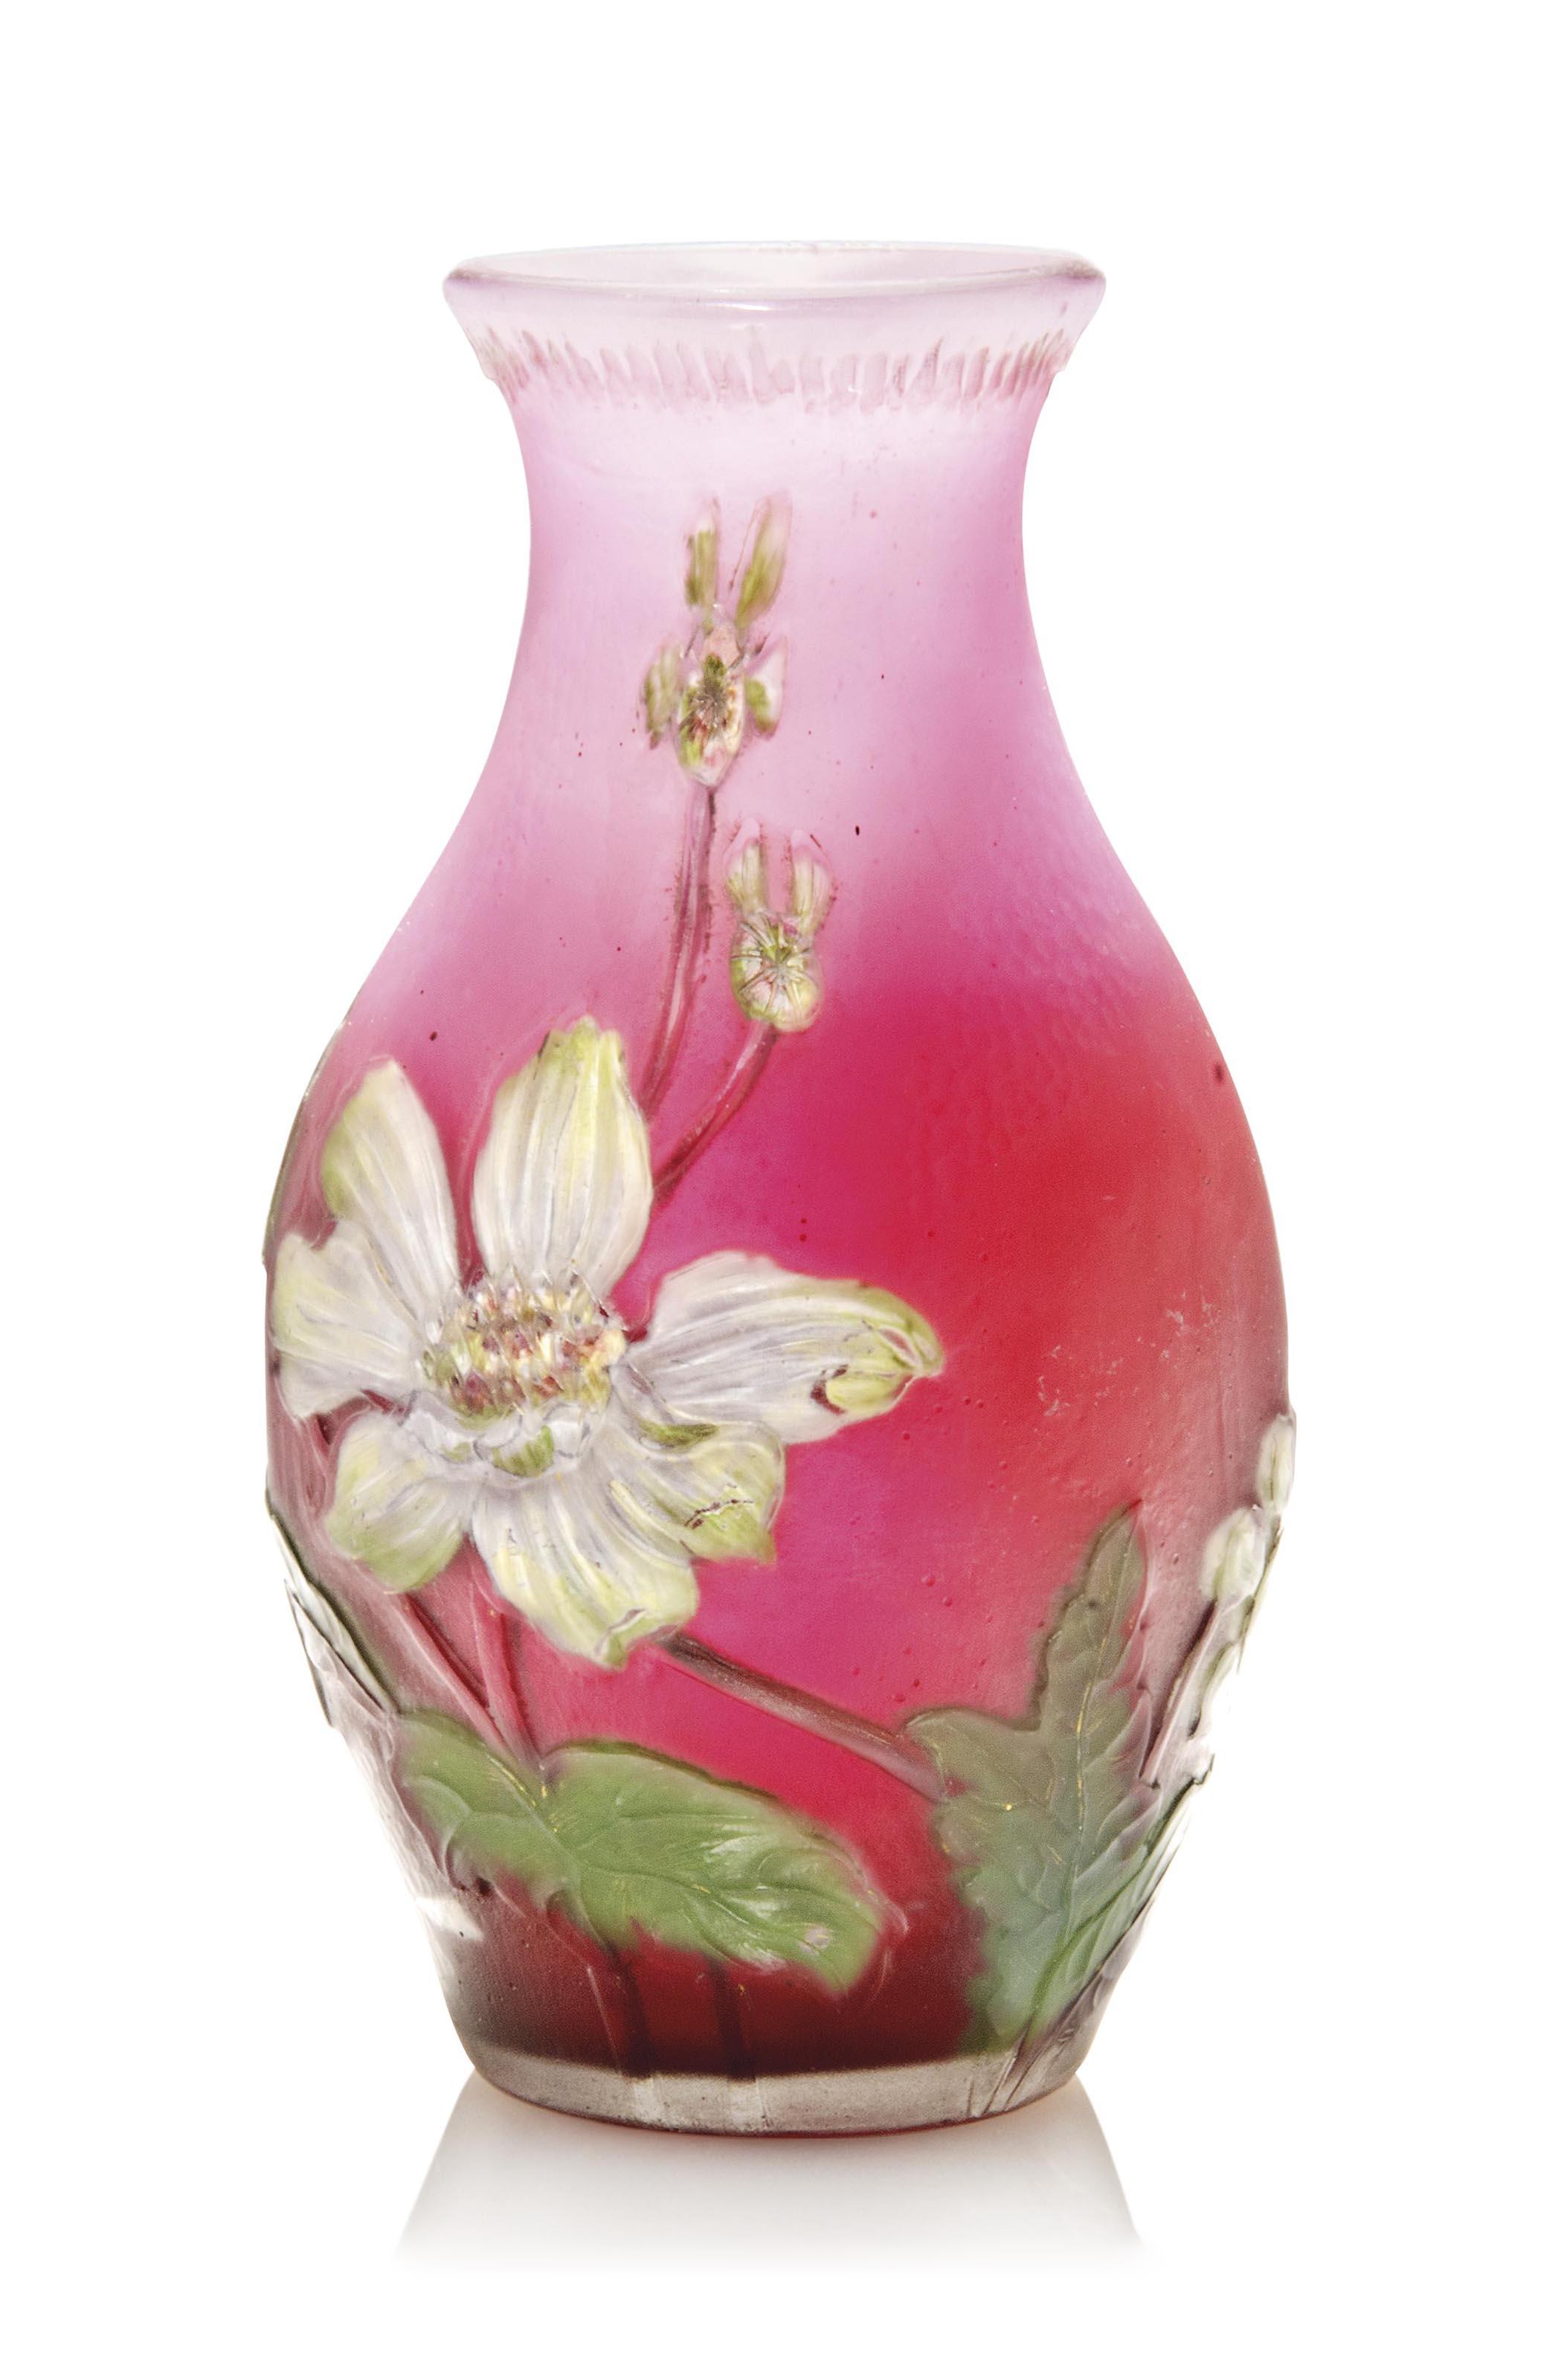 A BURGUN SCHVERER & CO (1711-1969) INTERNALLY DECORATED AND WHEEL CARVED GLASS VASE